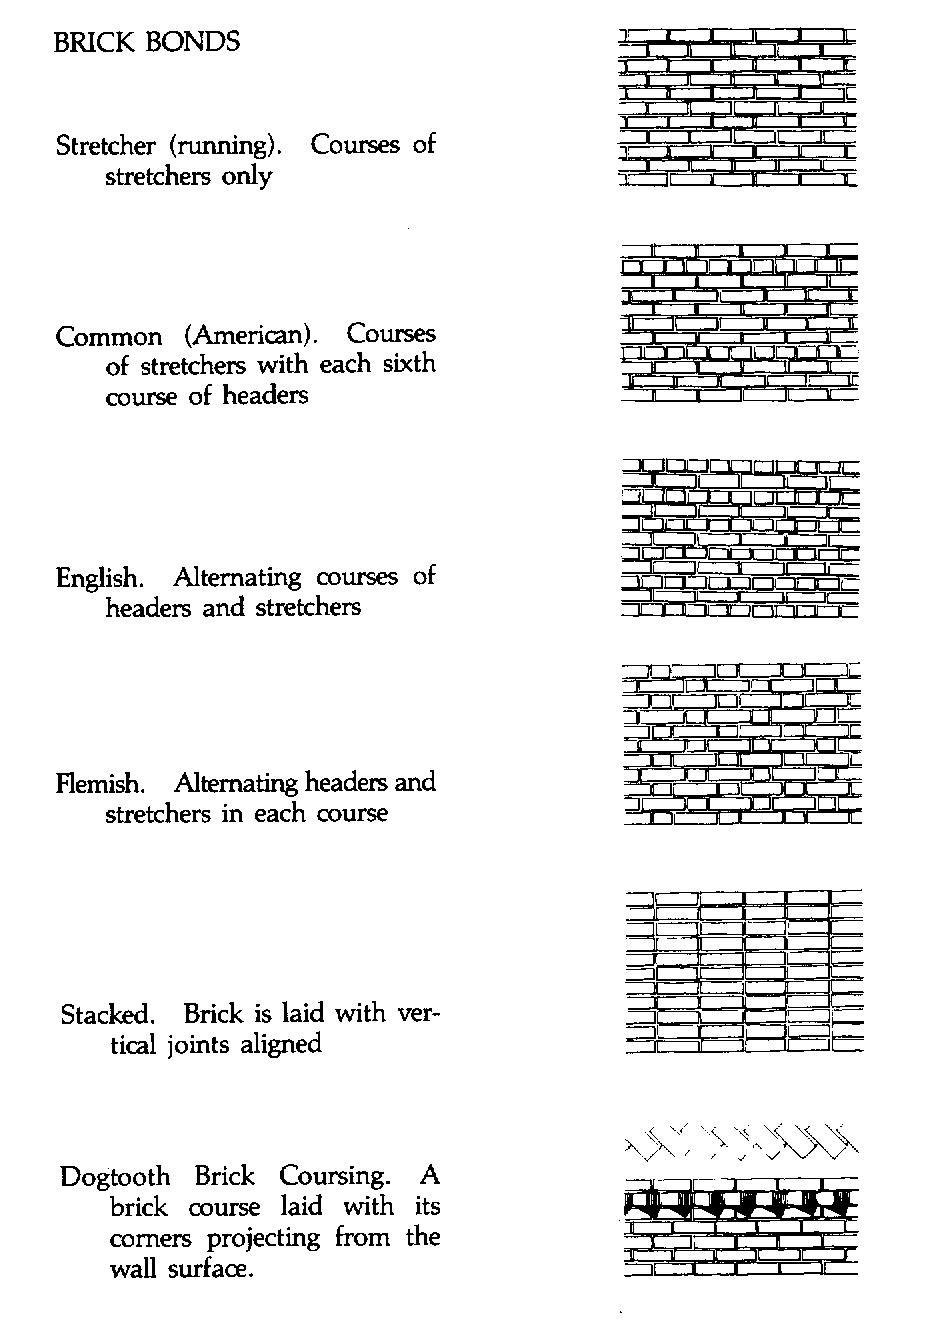 Brick Coursing Layout Types Brick Bonds Interior Design History Types Of Bricks